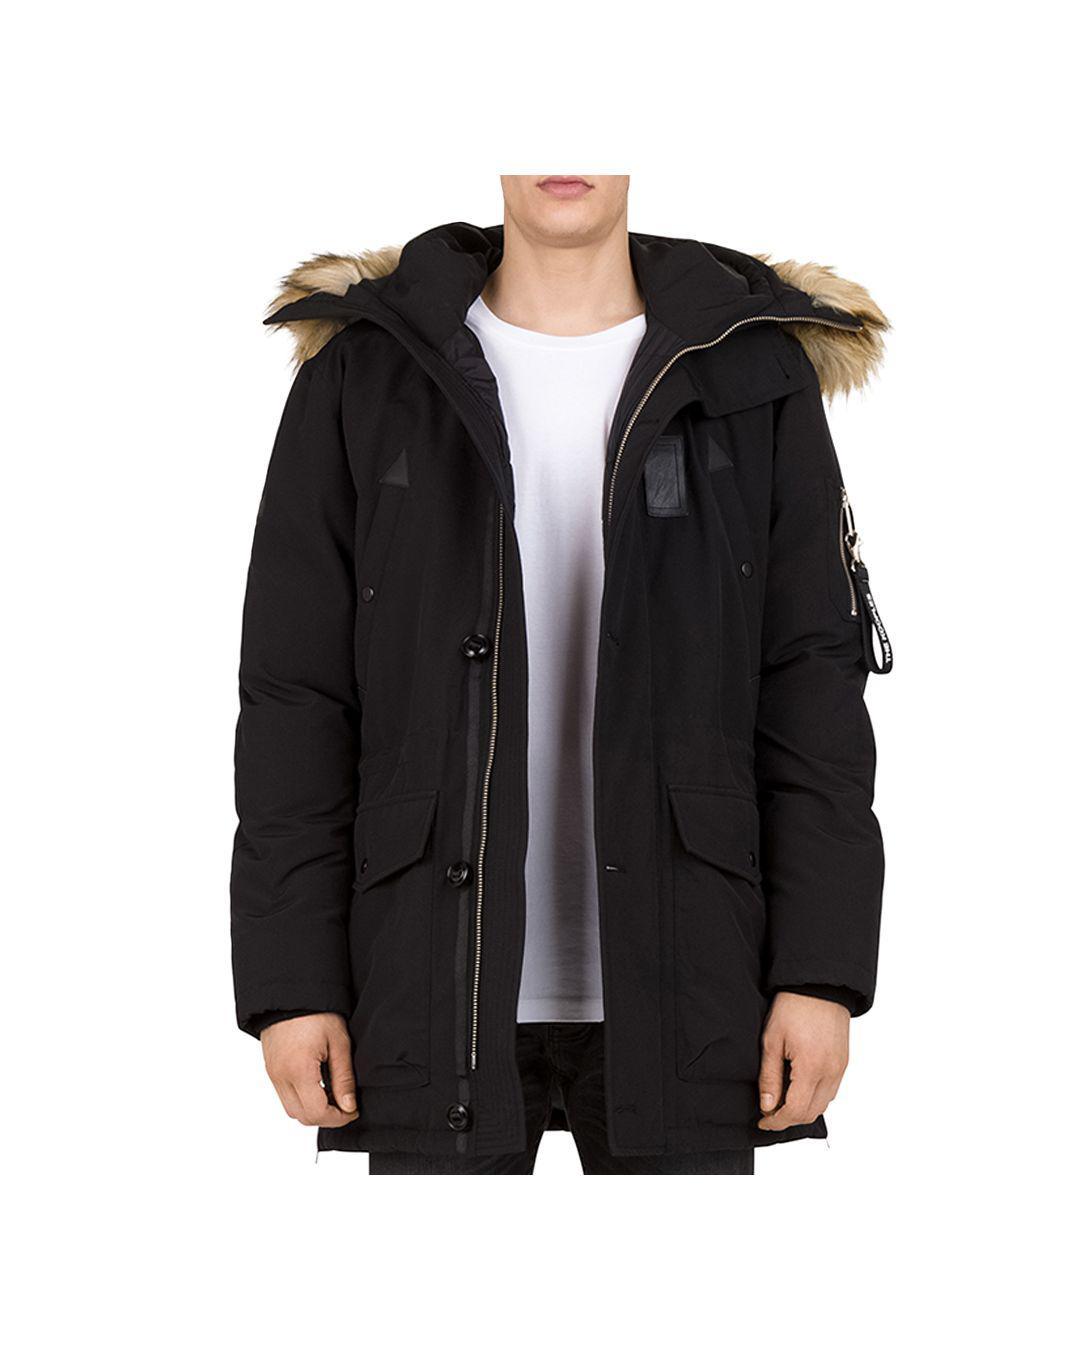 3bea0316e0 The Kooples Puffa Parka Jacket in Black for Men - Lyst